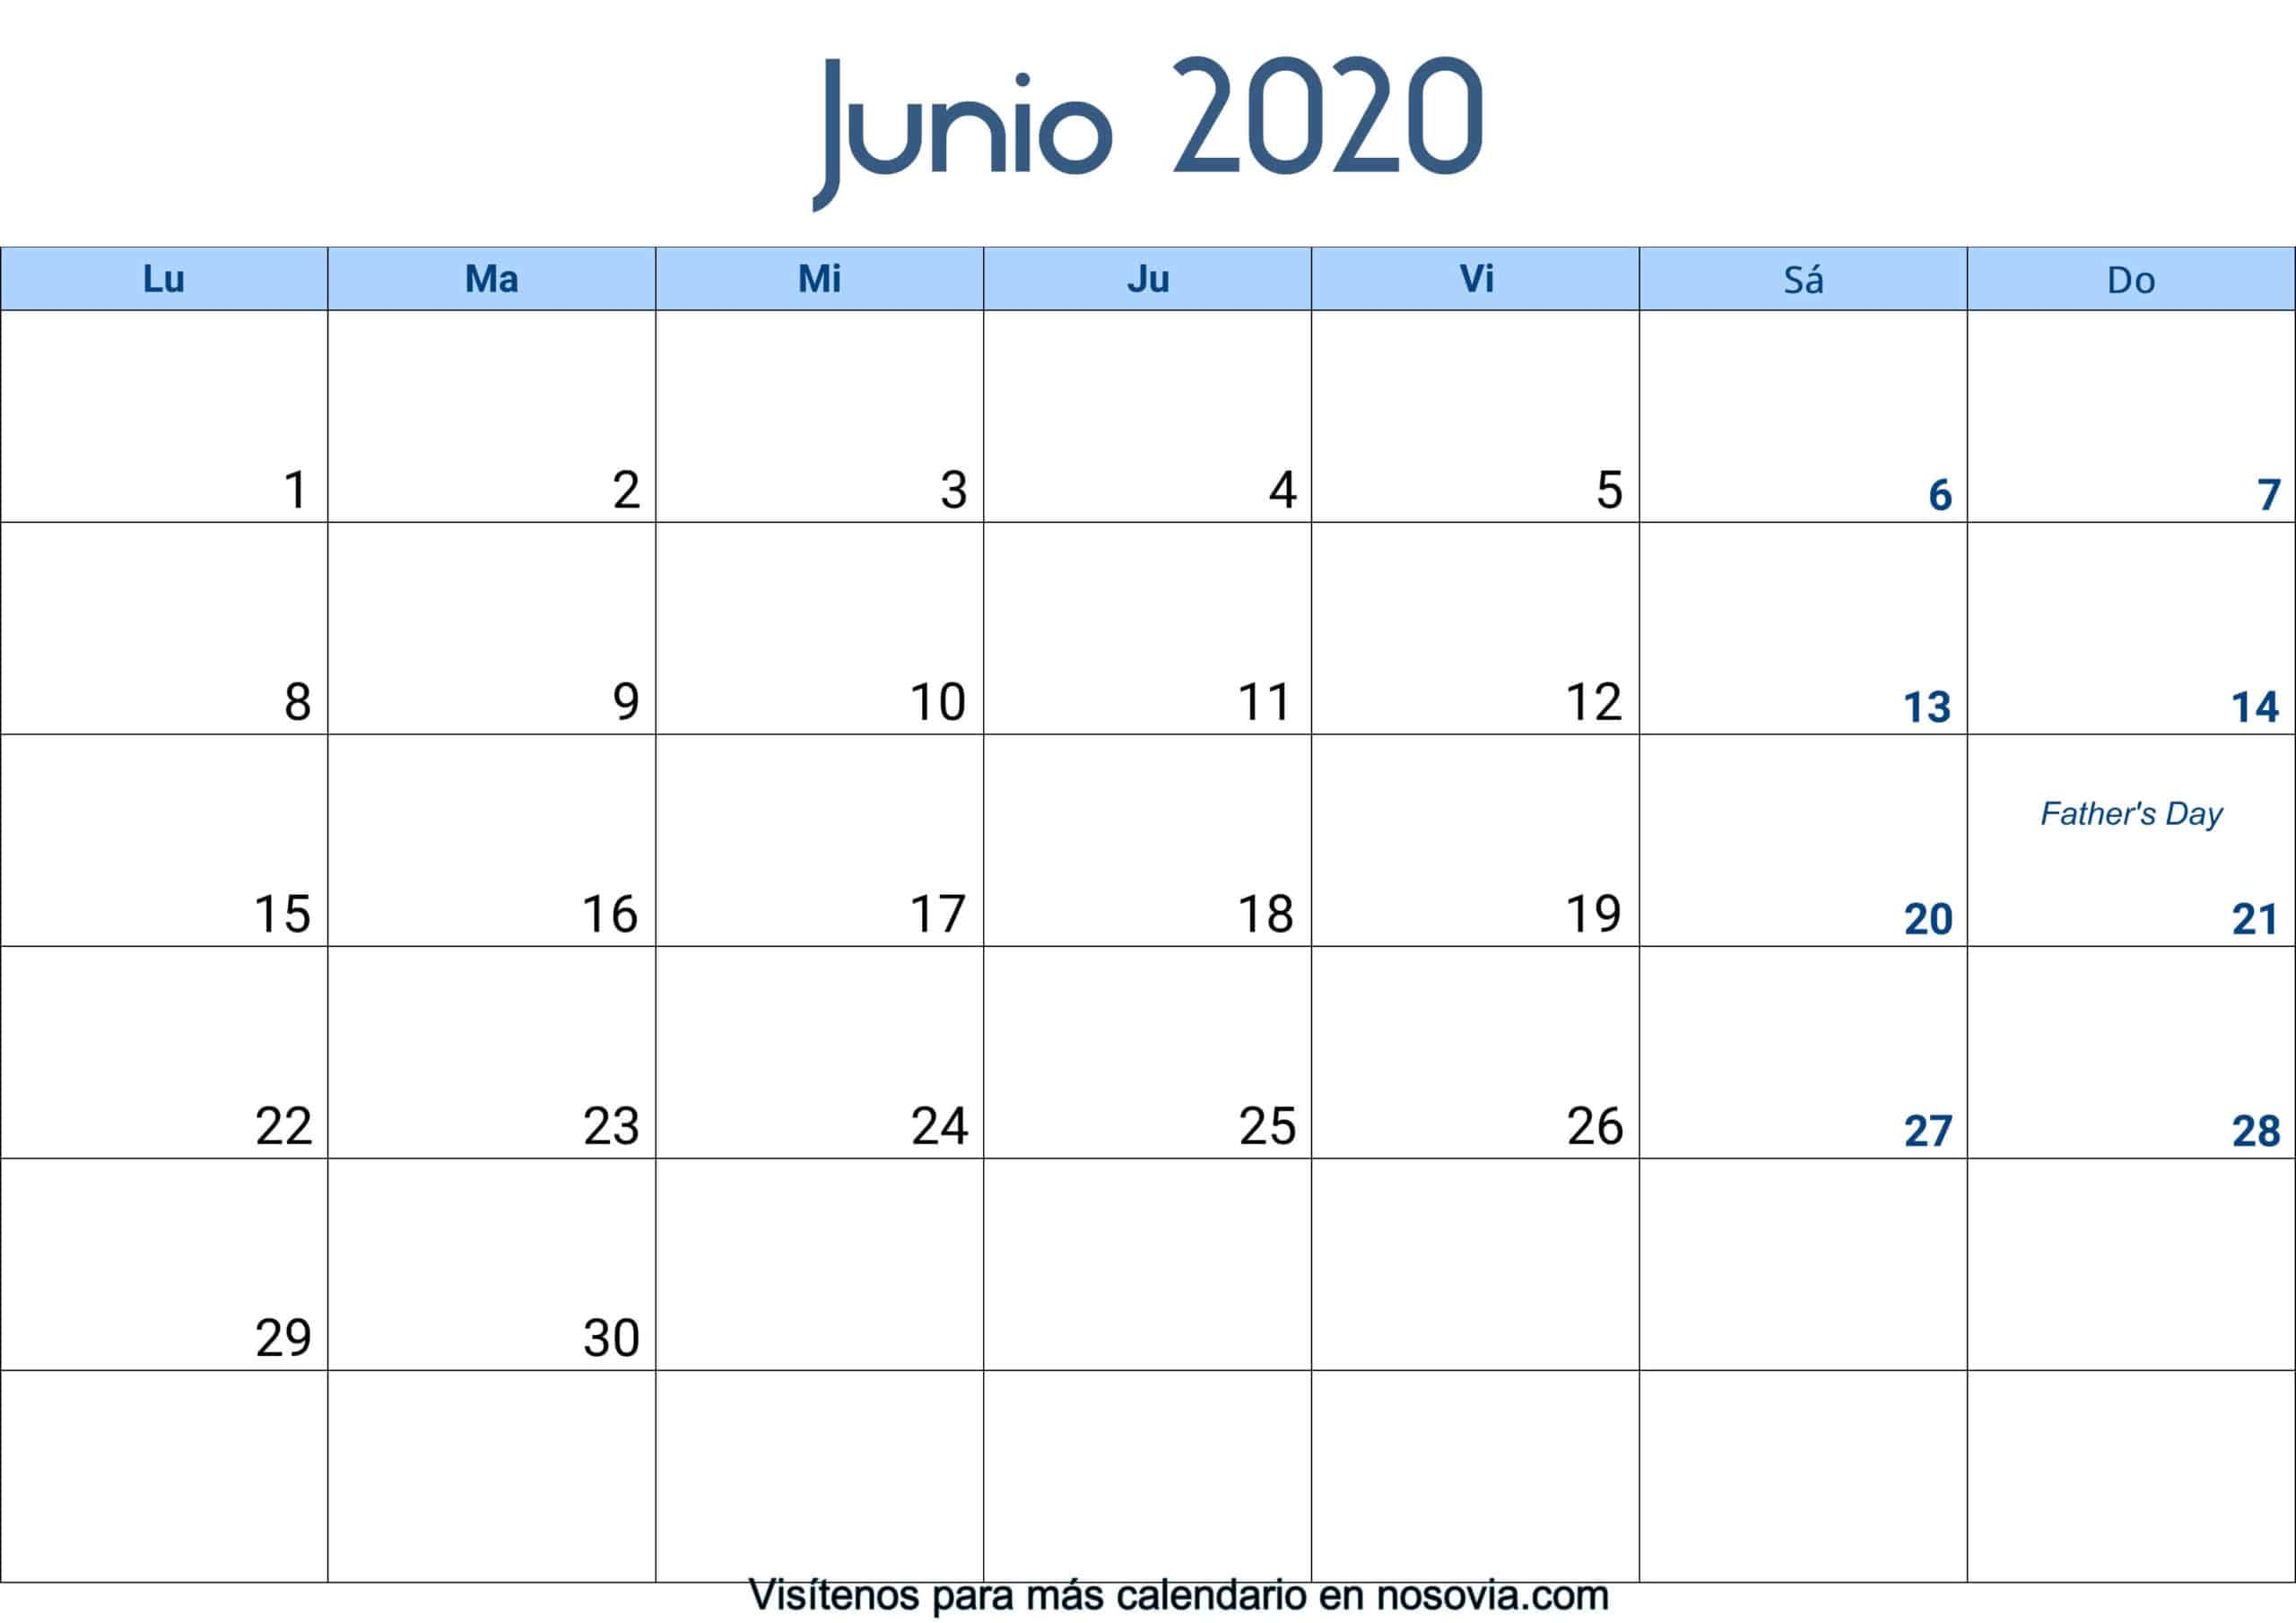 Calendario-junio-2020-Con-Festivos-Palabra